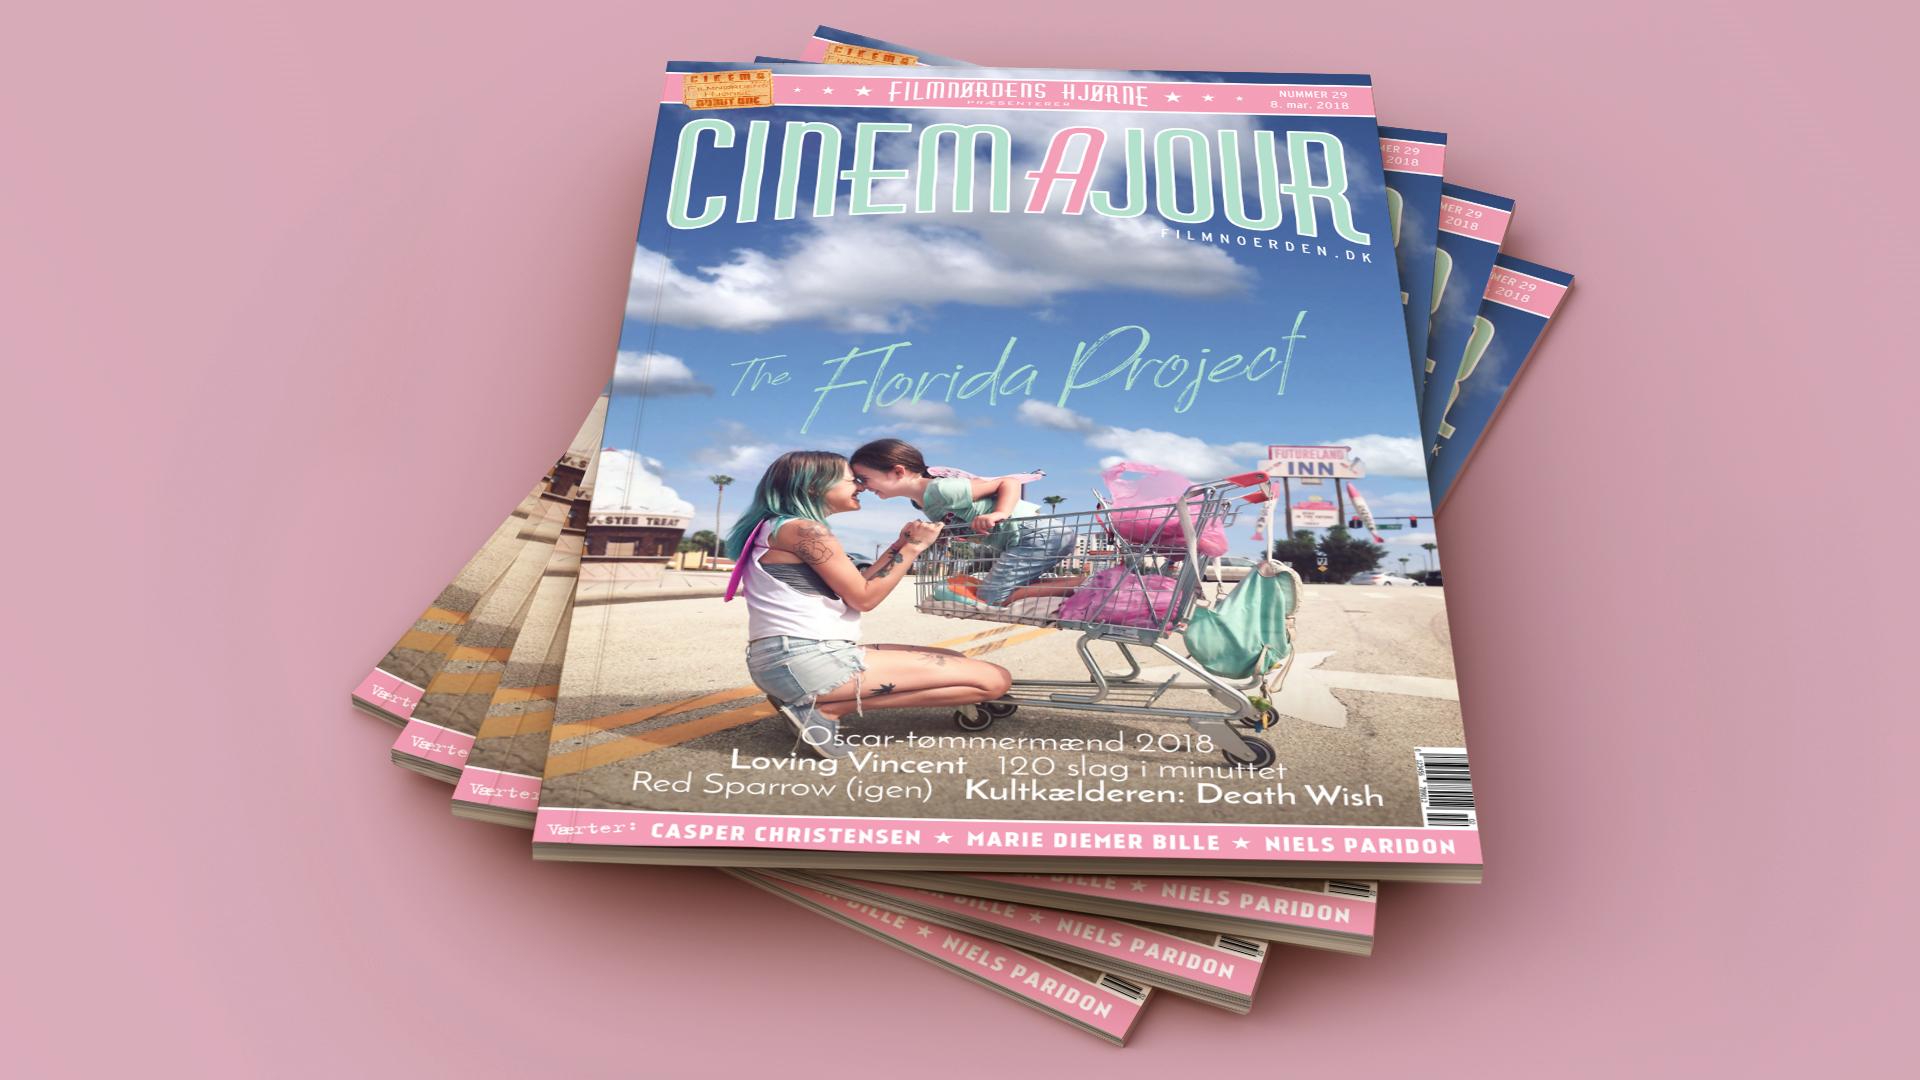 Cinemajour ep. 29 magazine mockup